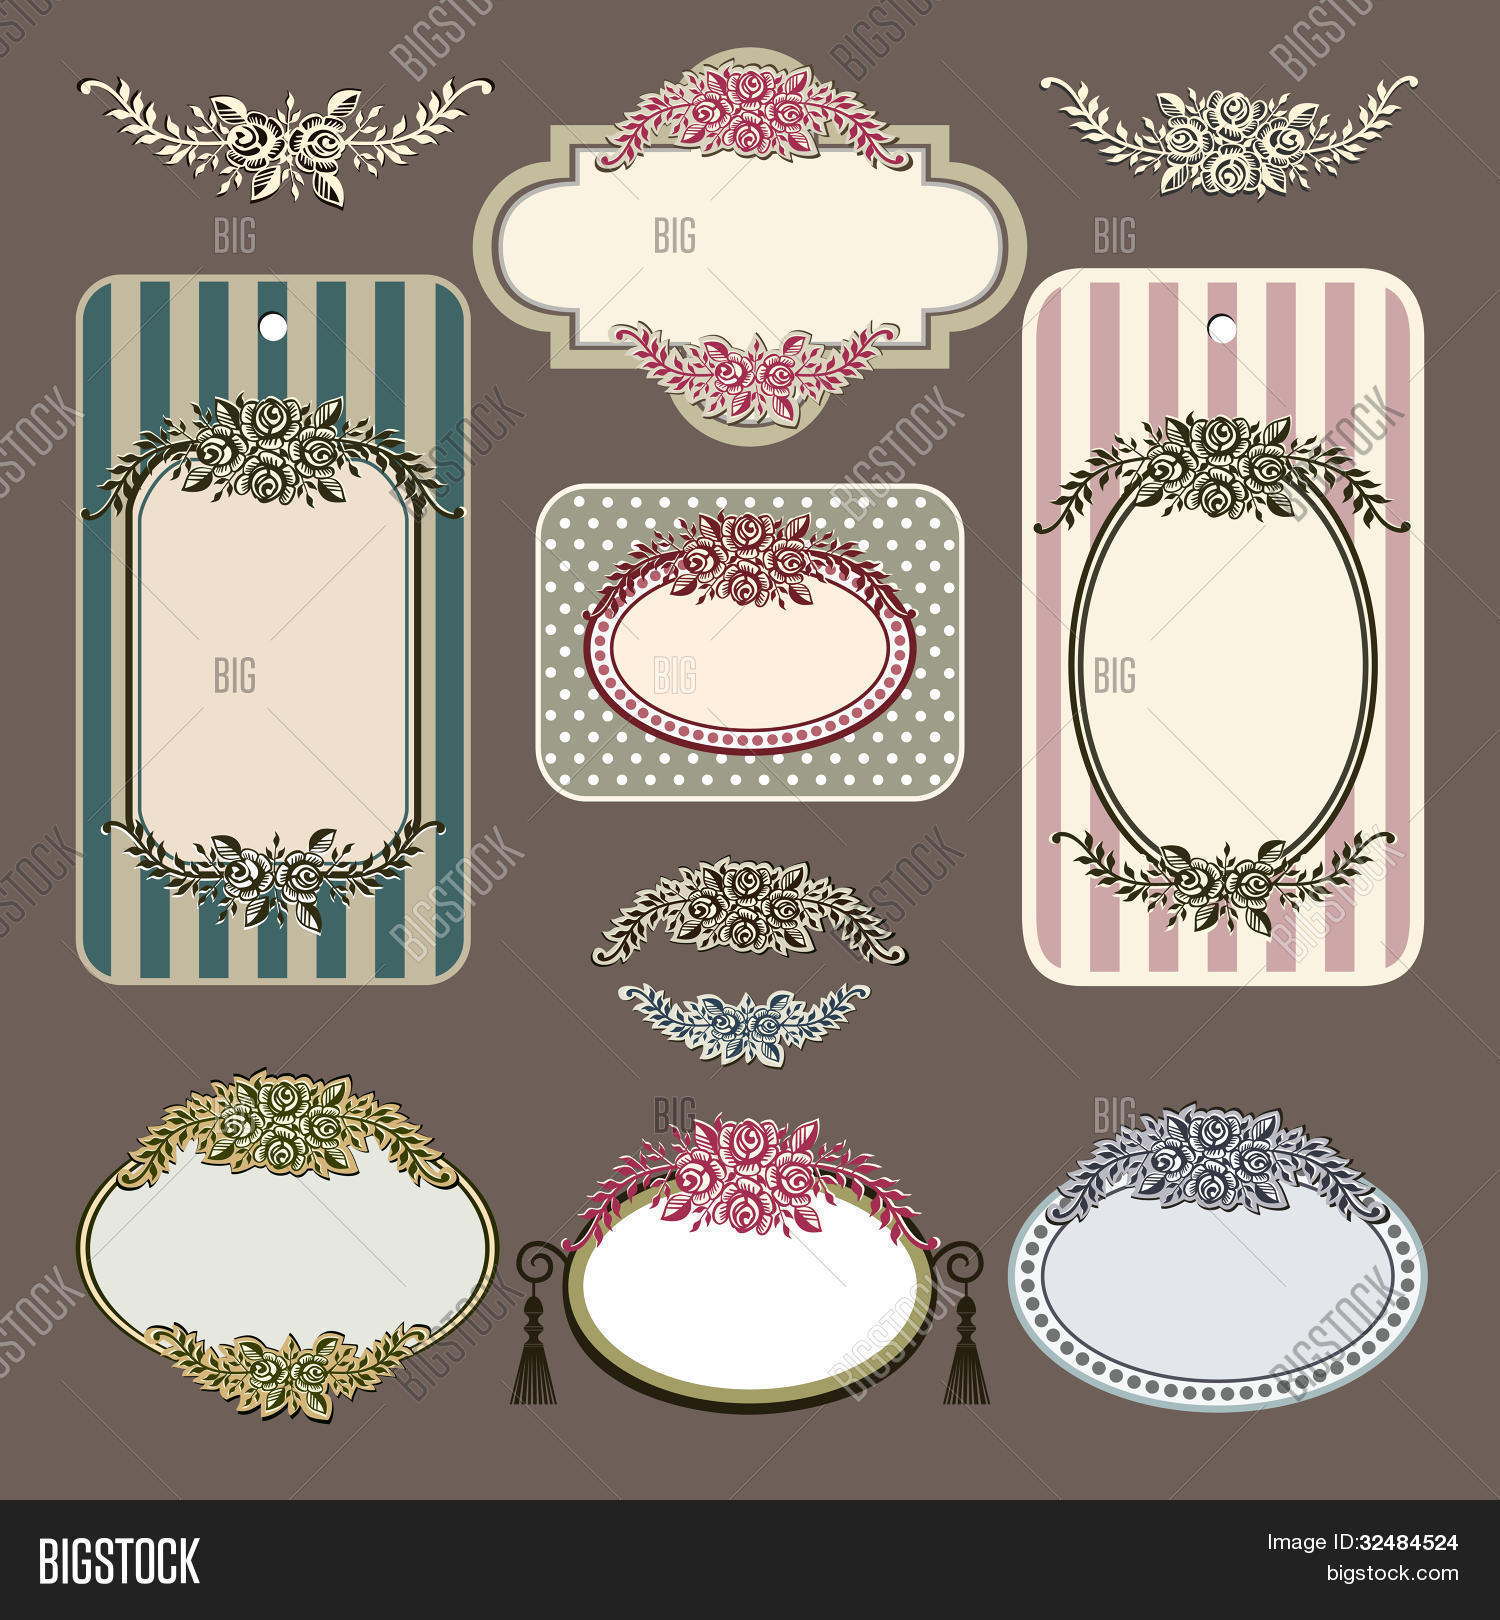 set retro roses vector photo free trial bigstock. Black Bedroom Furniture Sets. Home Design Ideas